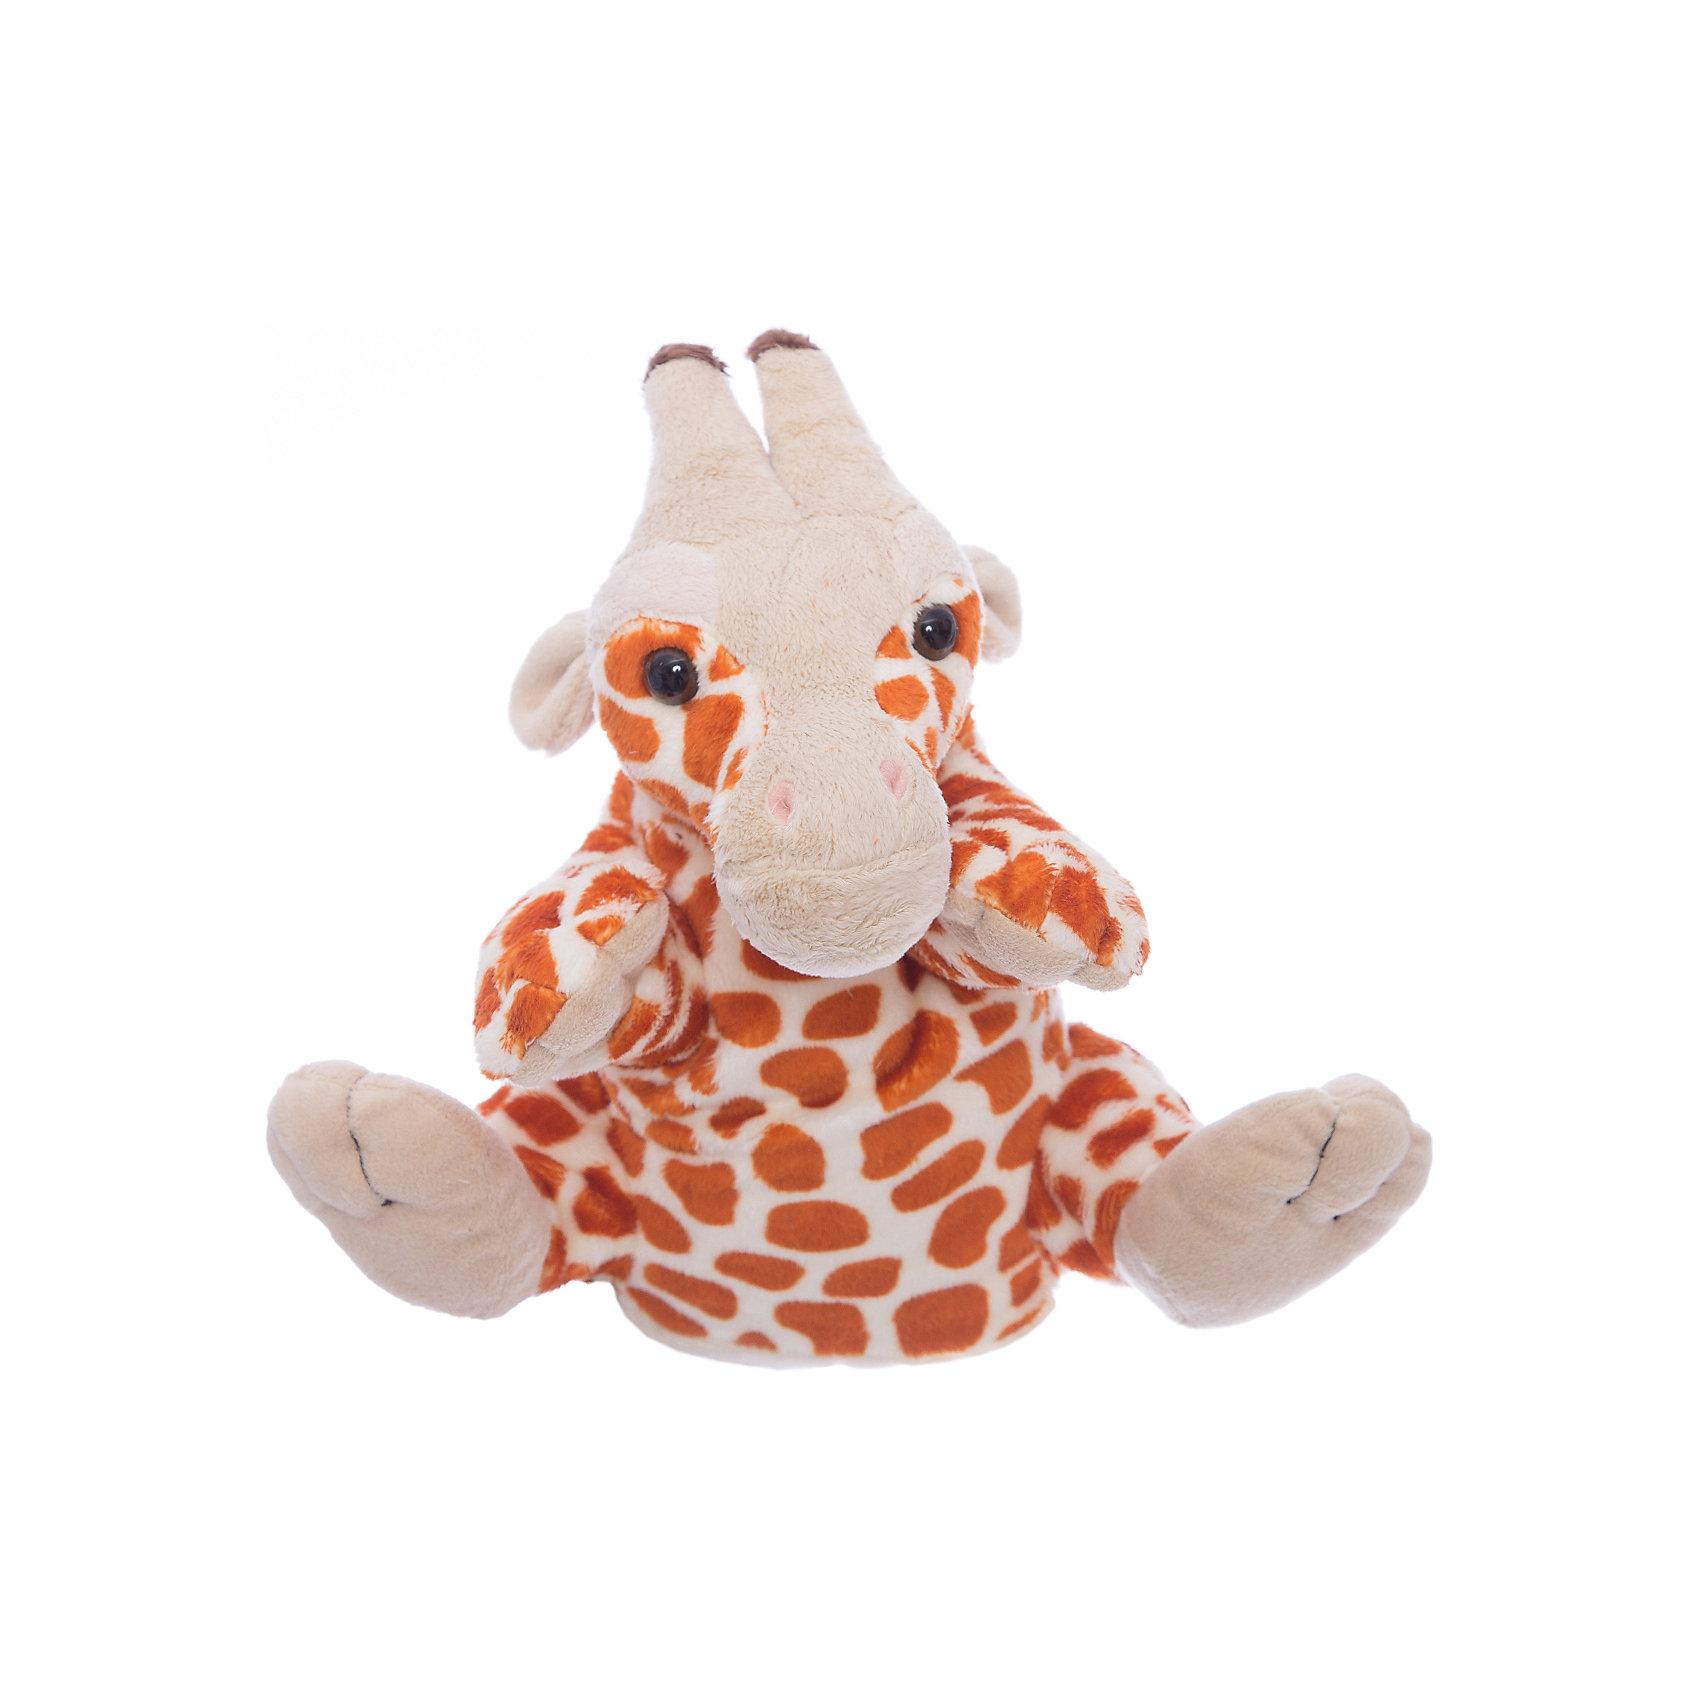 Gulliver Gulliver Мягкая игрушка жираф-руковичка, 27см игрушка мягкая gulliver кукла хозяюшка 30см